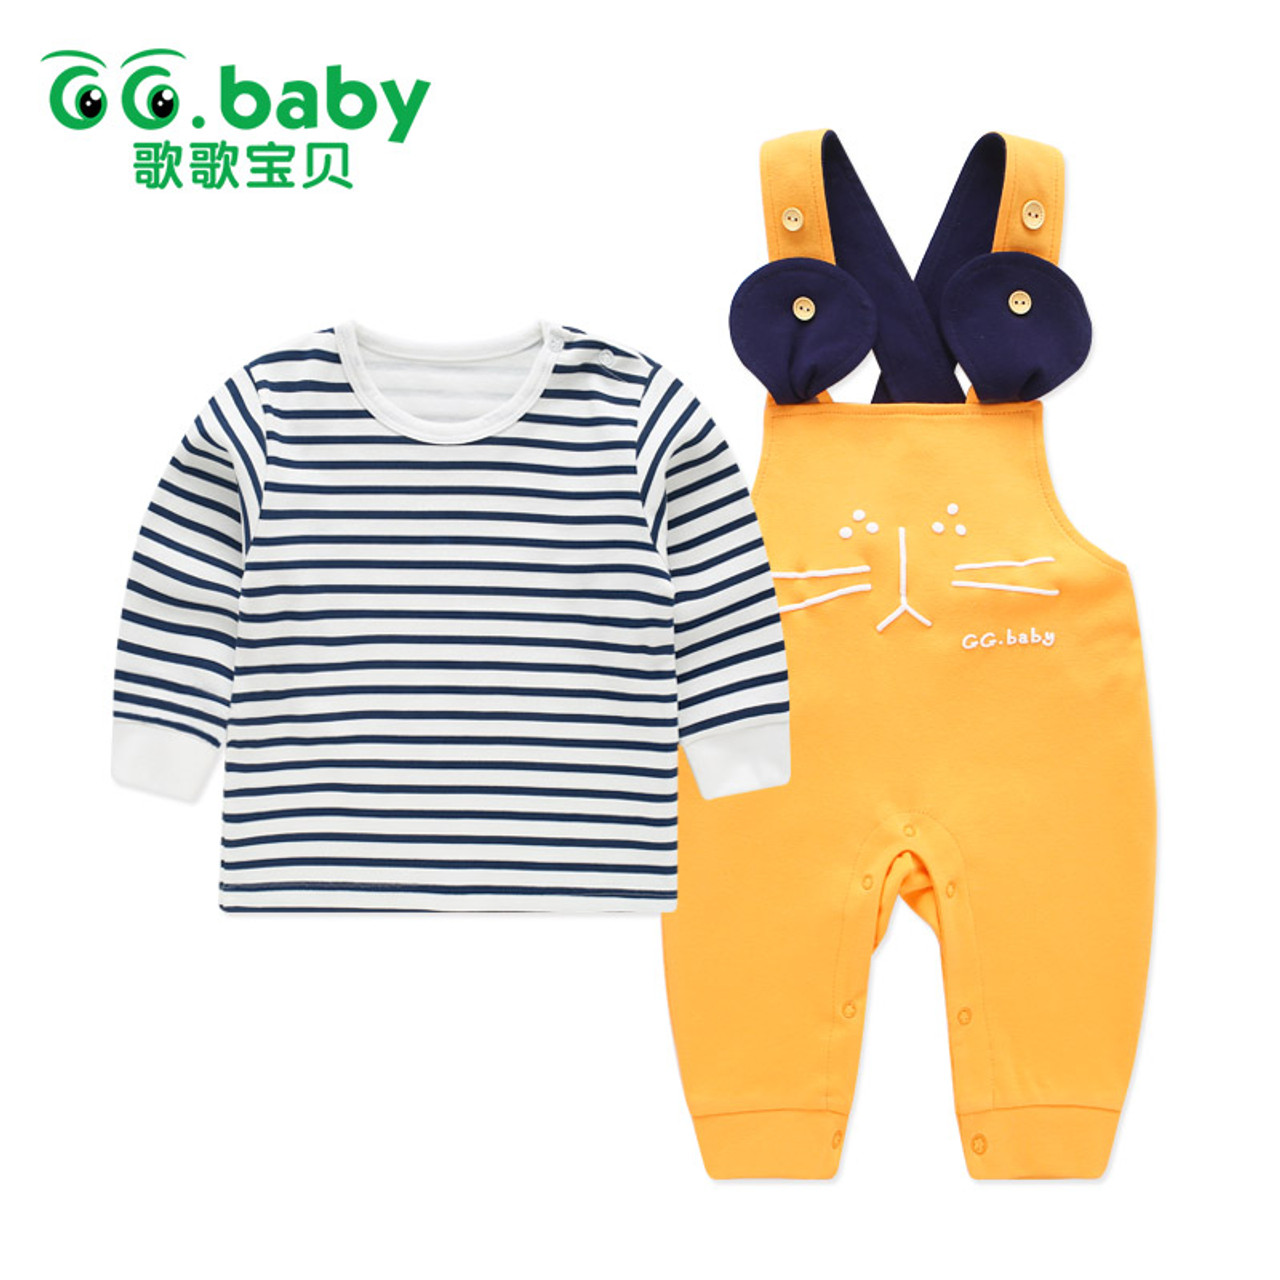 Newborn Baby Boy Clothes Gentleman Grey Striped Shirt Plus Overalls 3 to 24m New